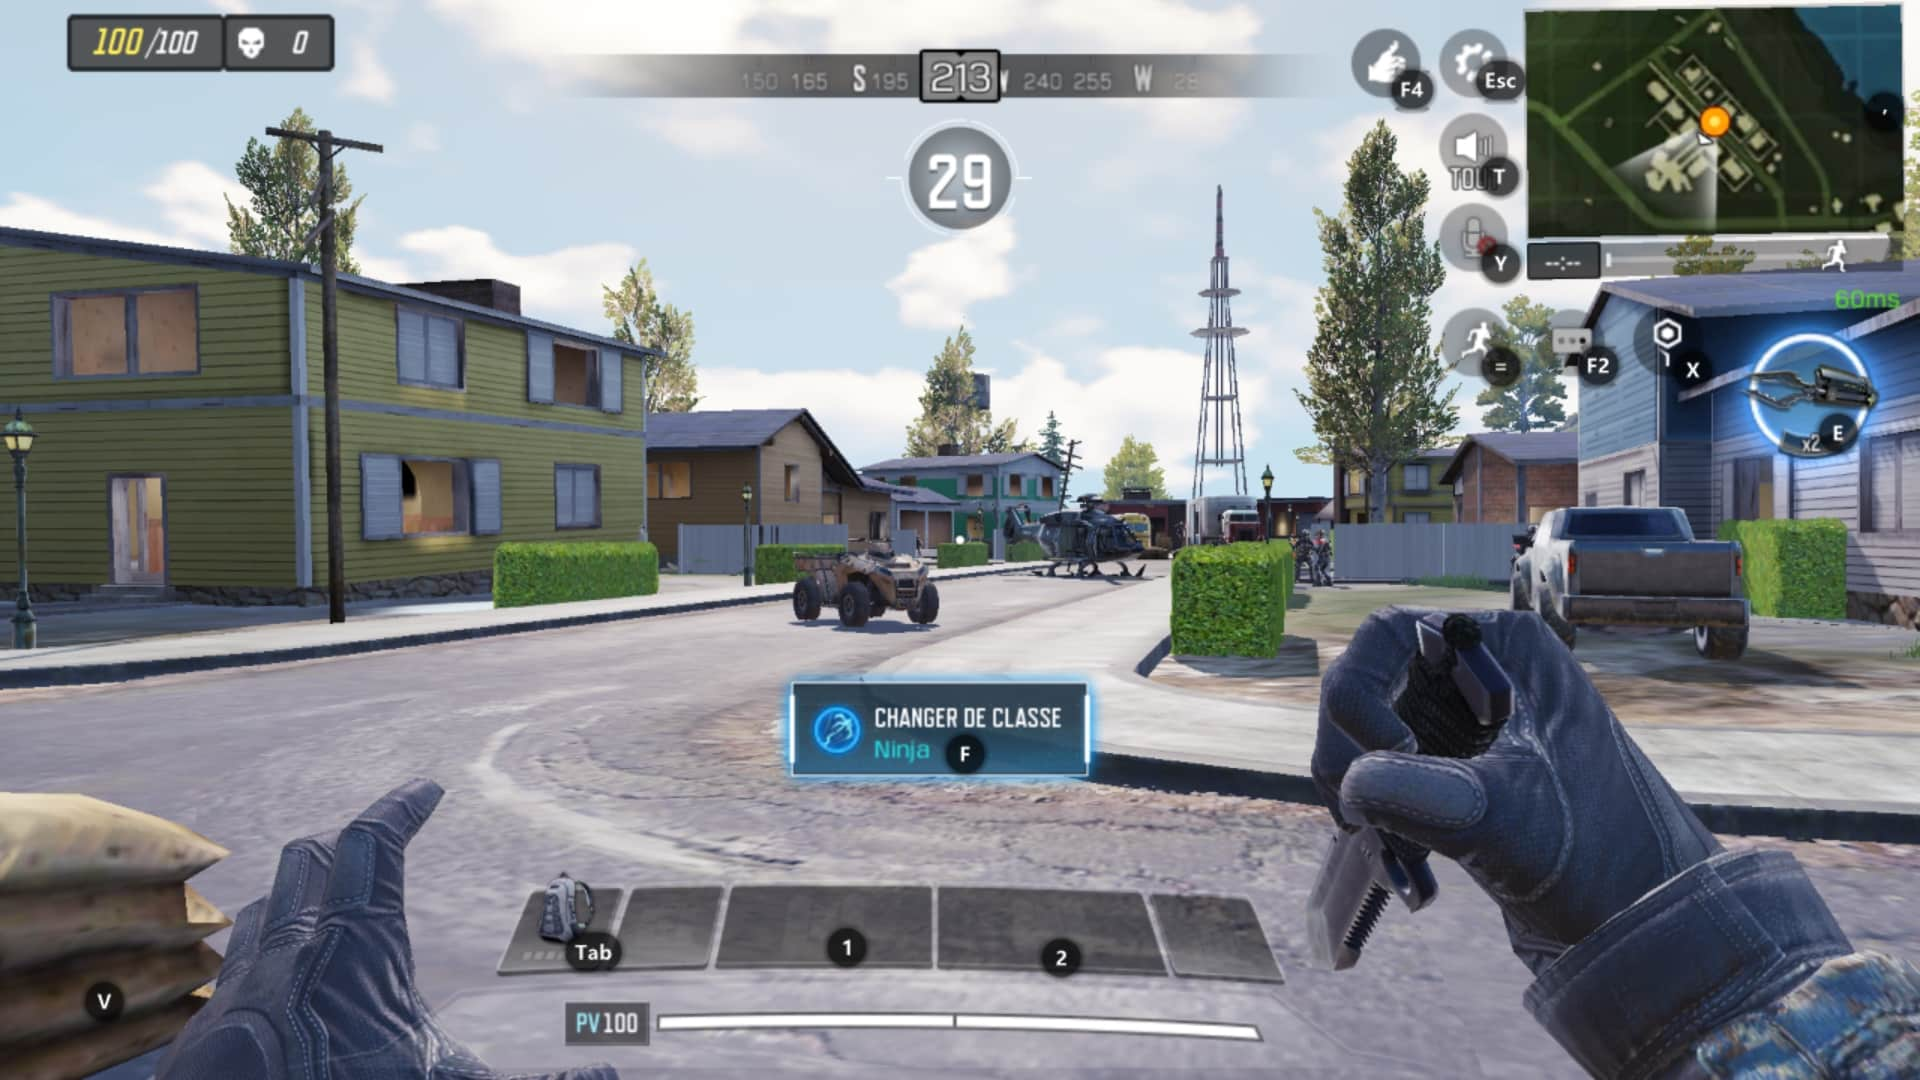 nuketown-ville-call-of-duty-mobile-carte-saison-1-isolated